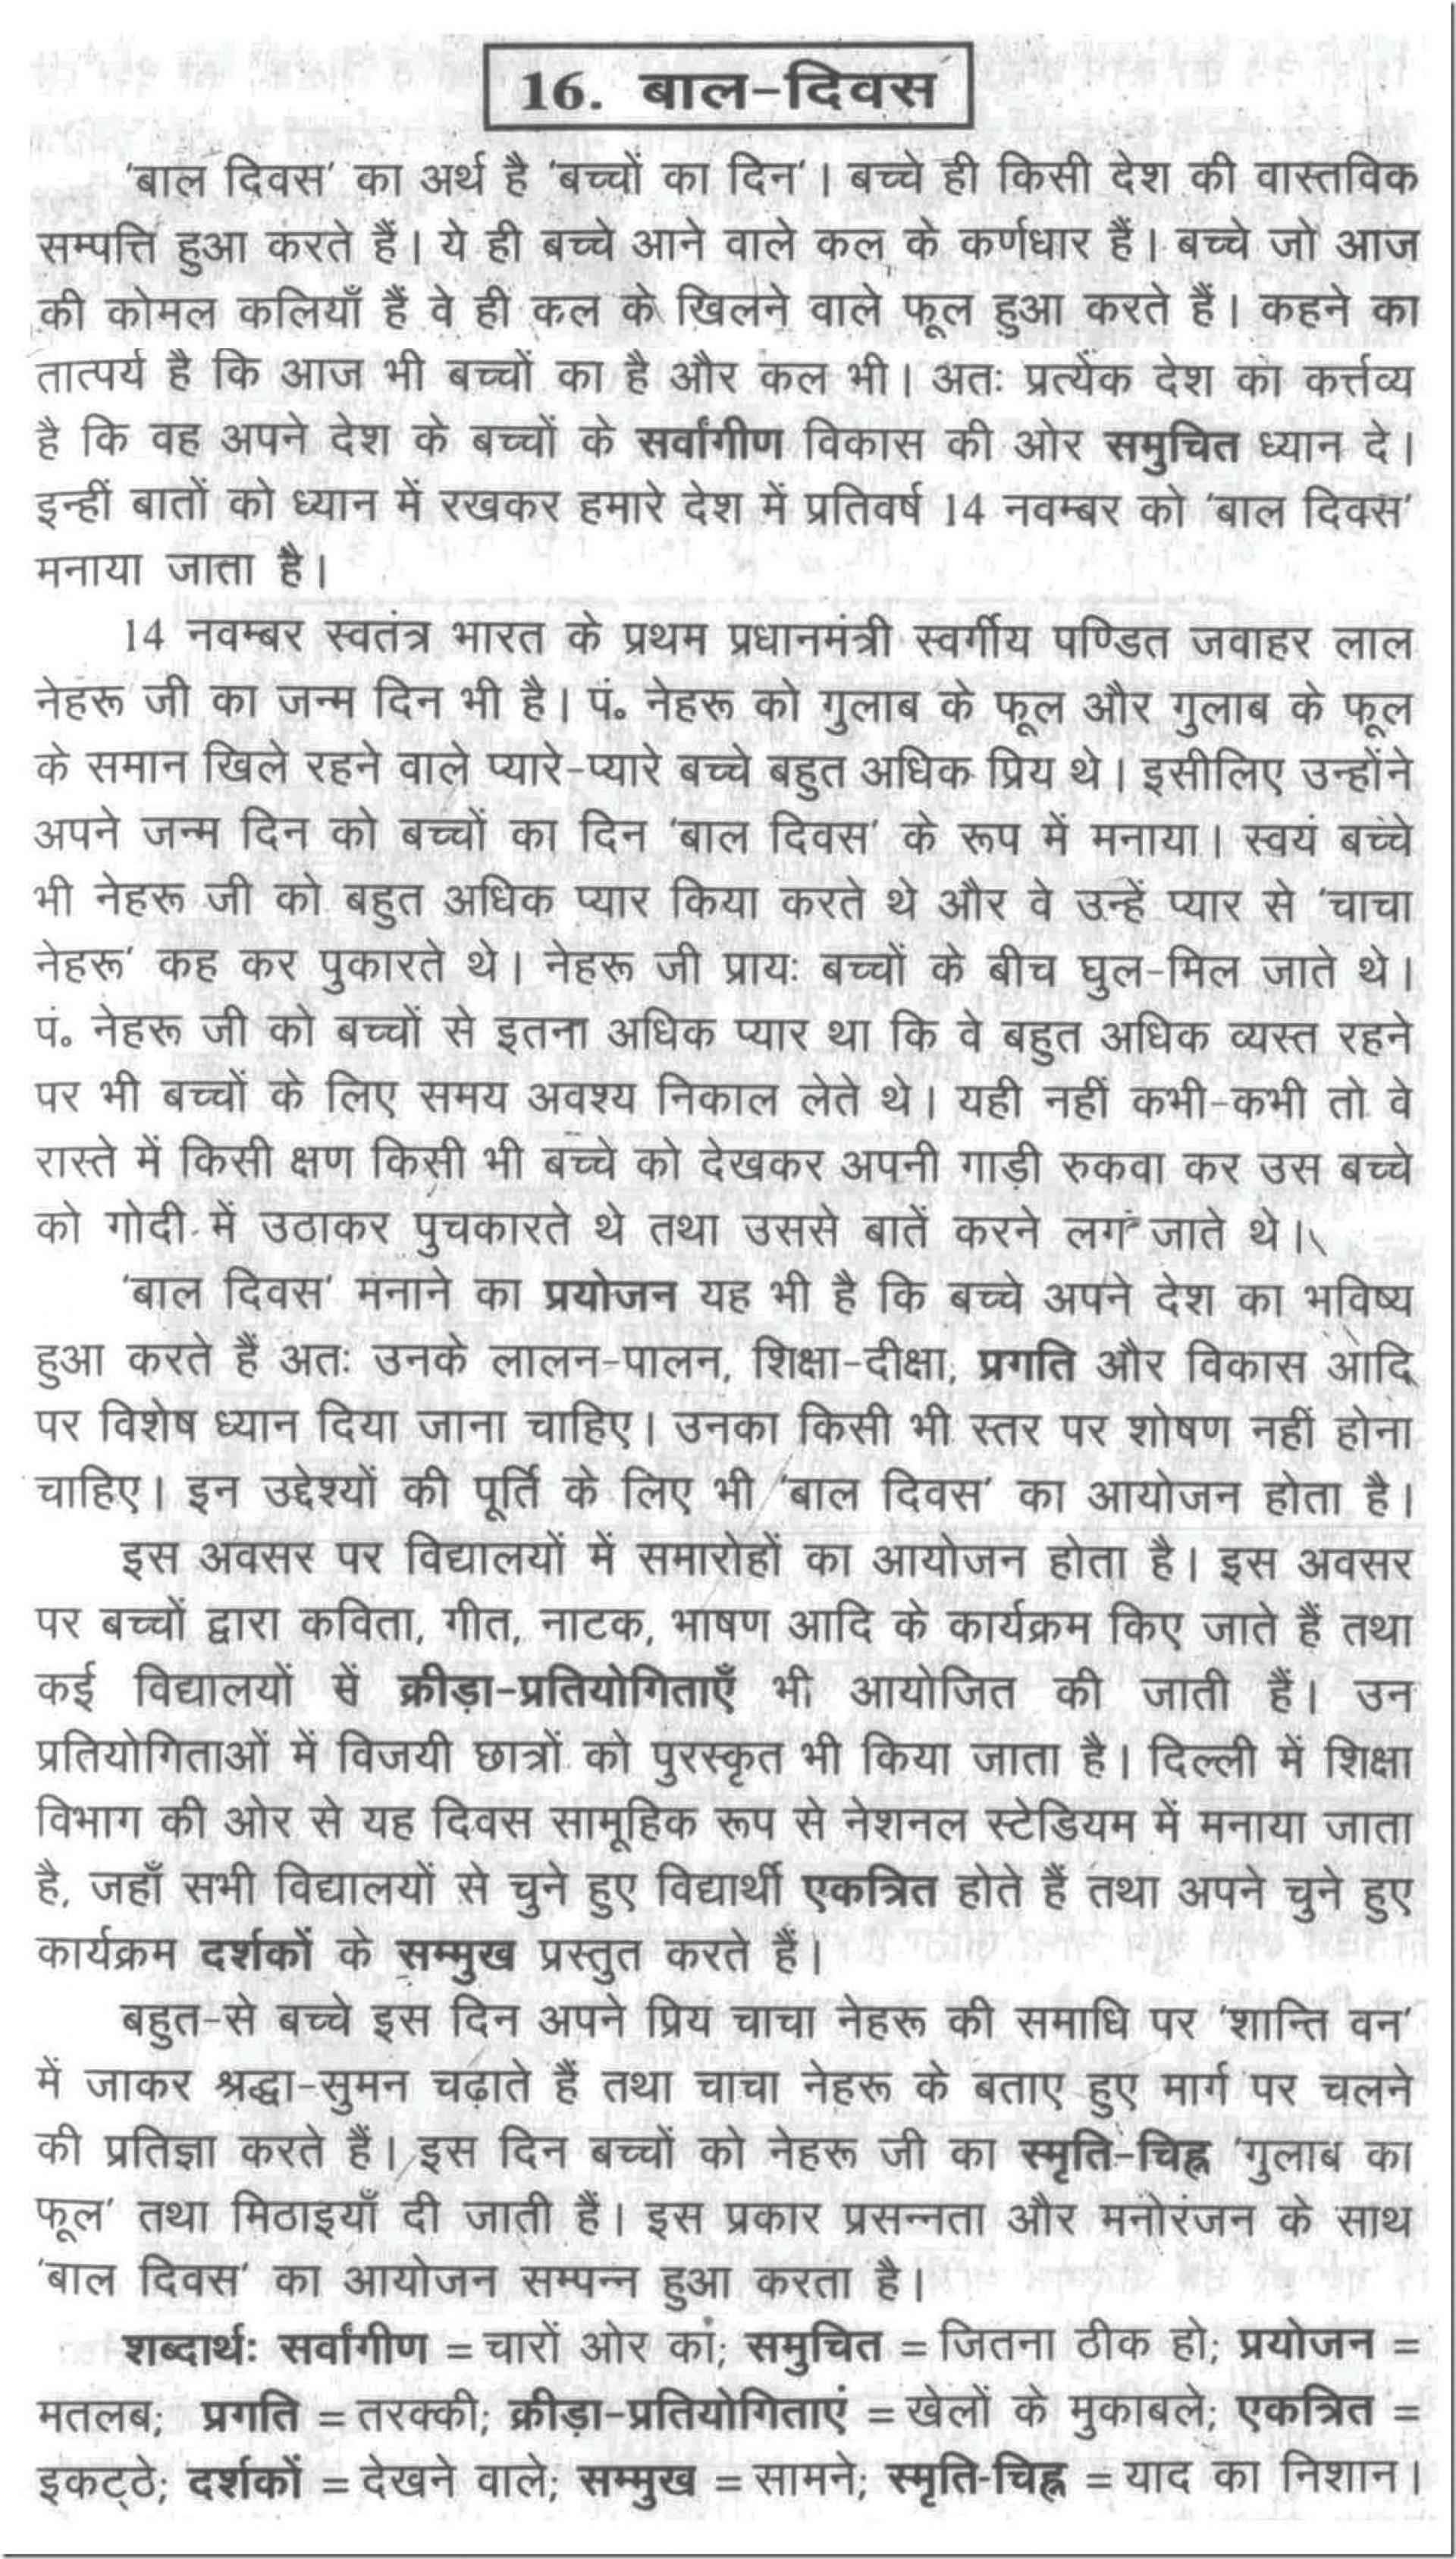 008 Marathi Essay On Rain Formidable If Does Not Fall Picnic In Rainy Season For Class 10 1920